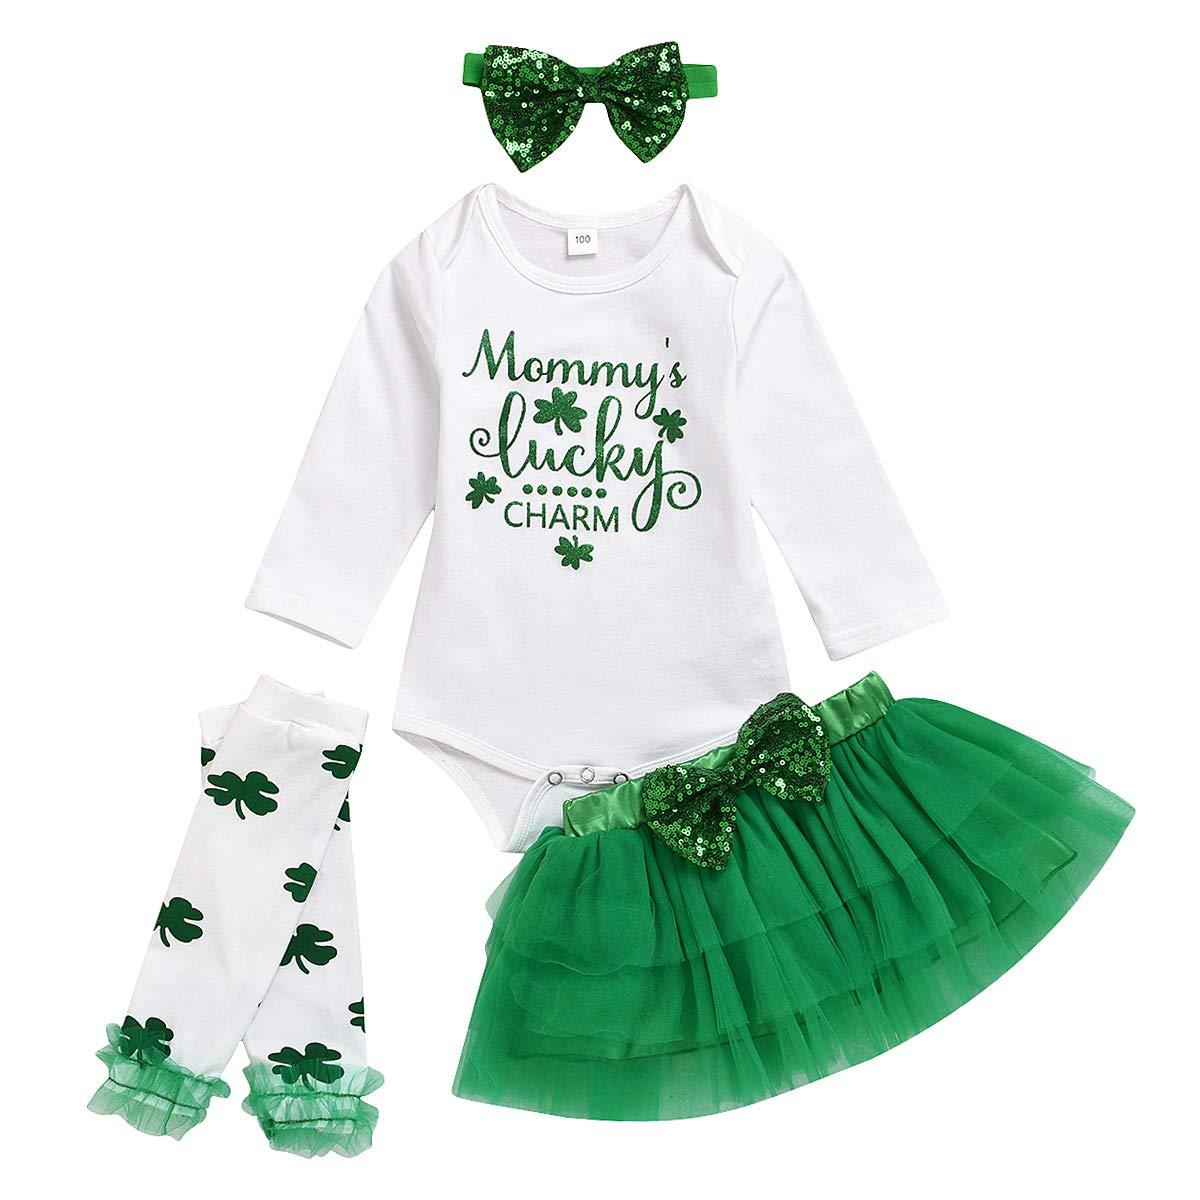 4PCS Newborn Baby Girl Clothes My 1st St.Patrick Day Outfits Romper+Bowtie Mesh Skirt+Leggings+Headband